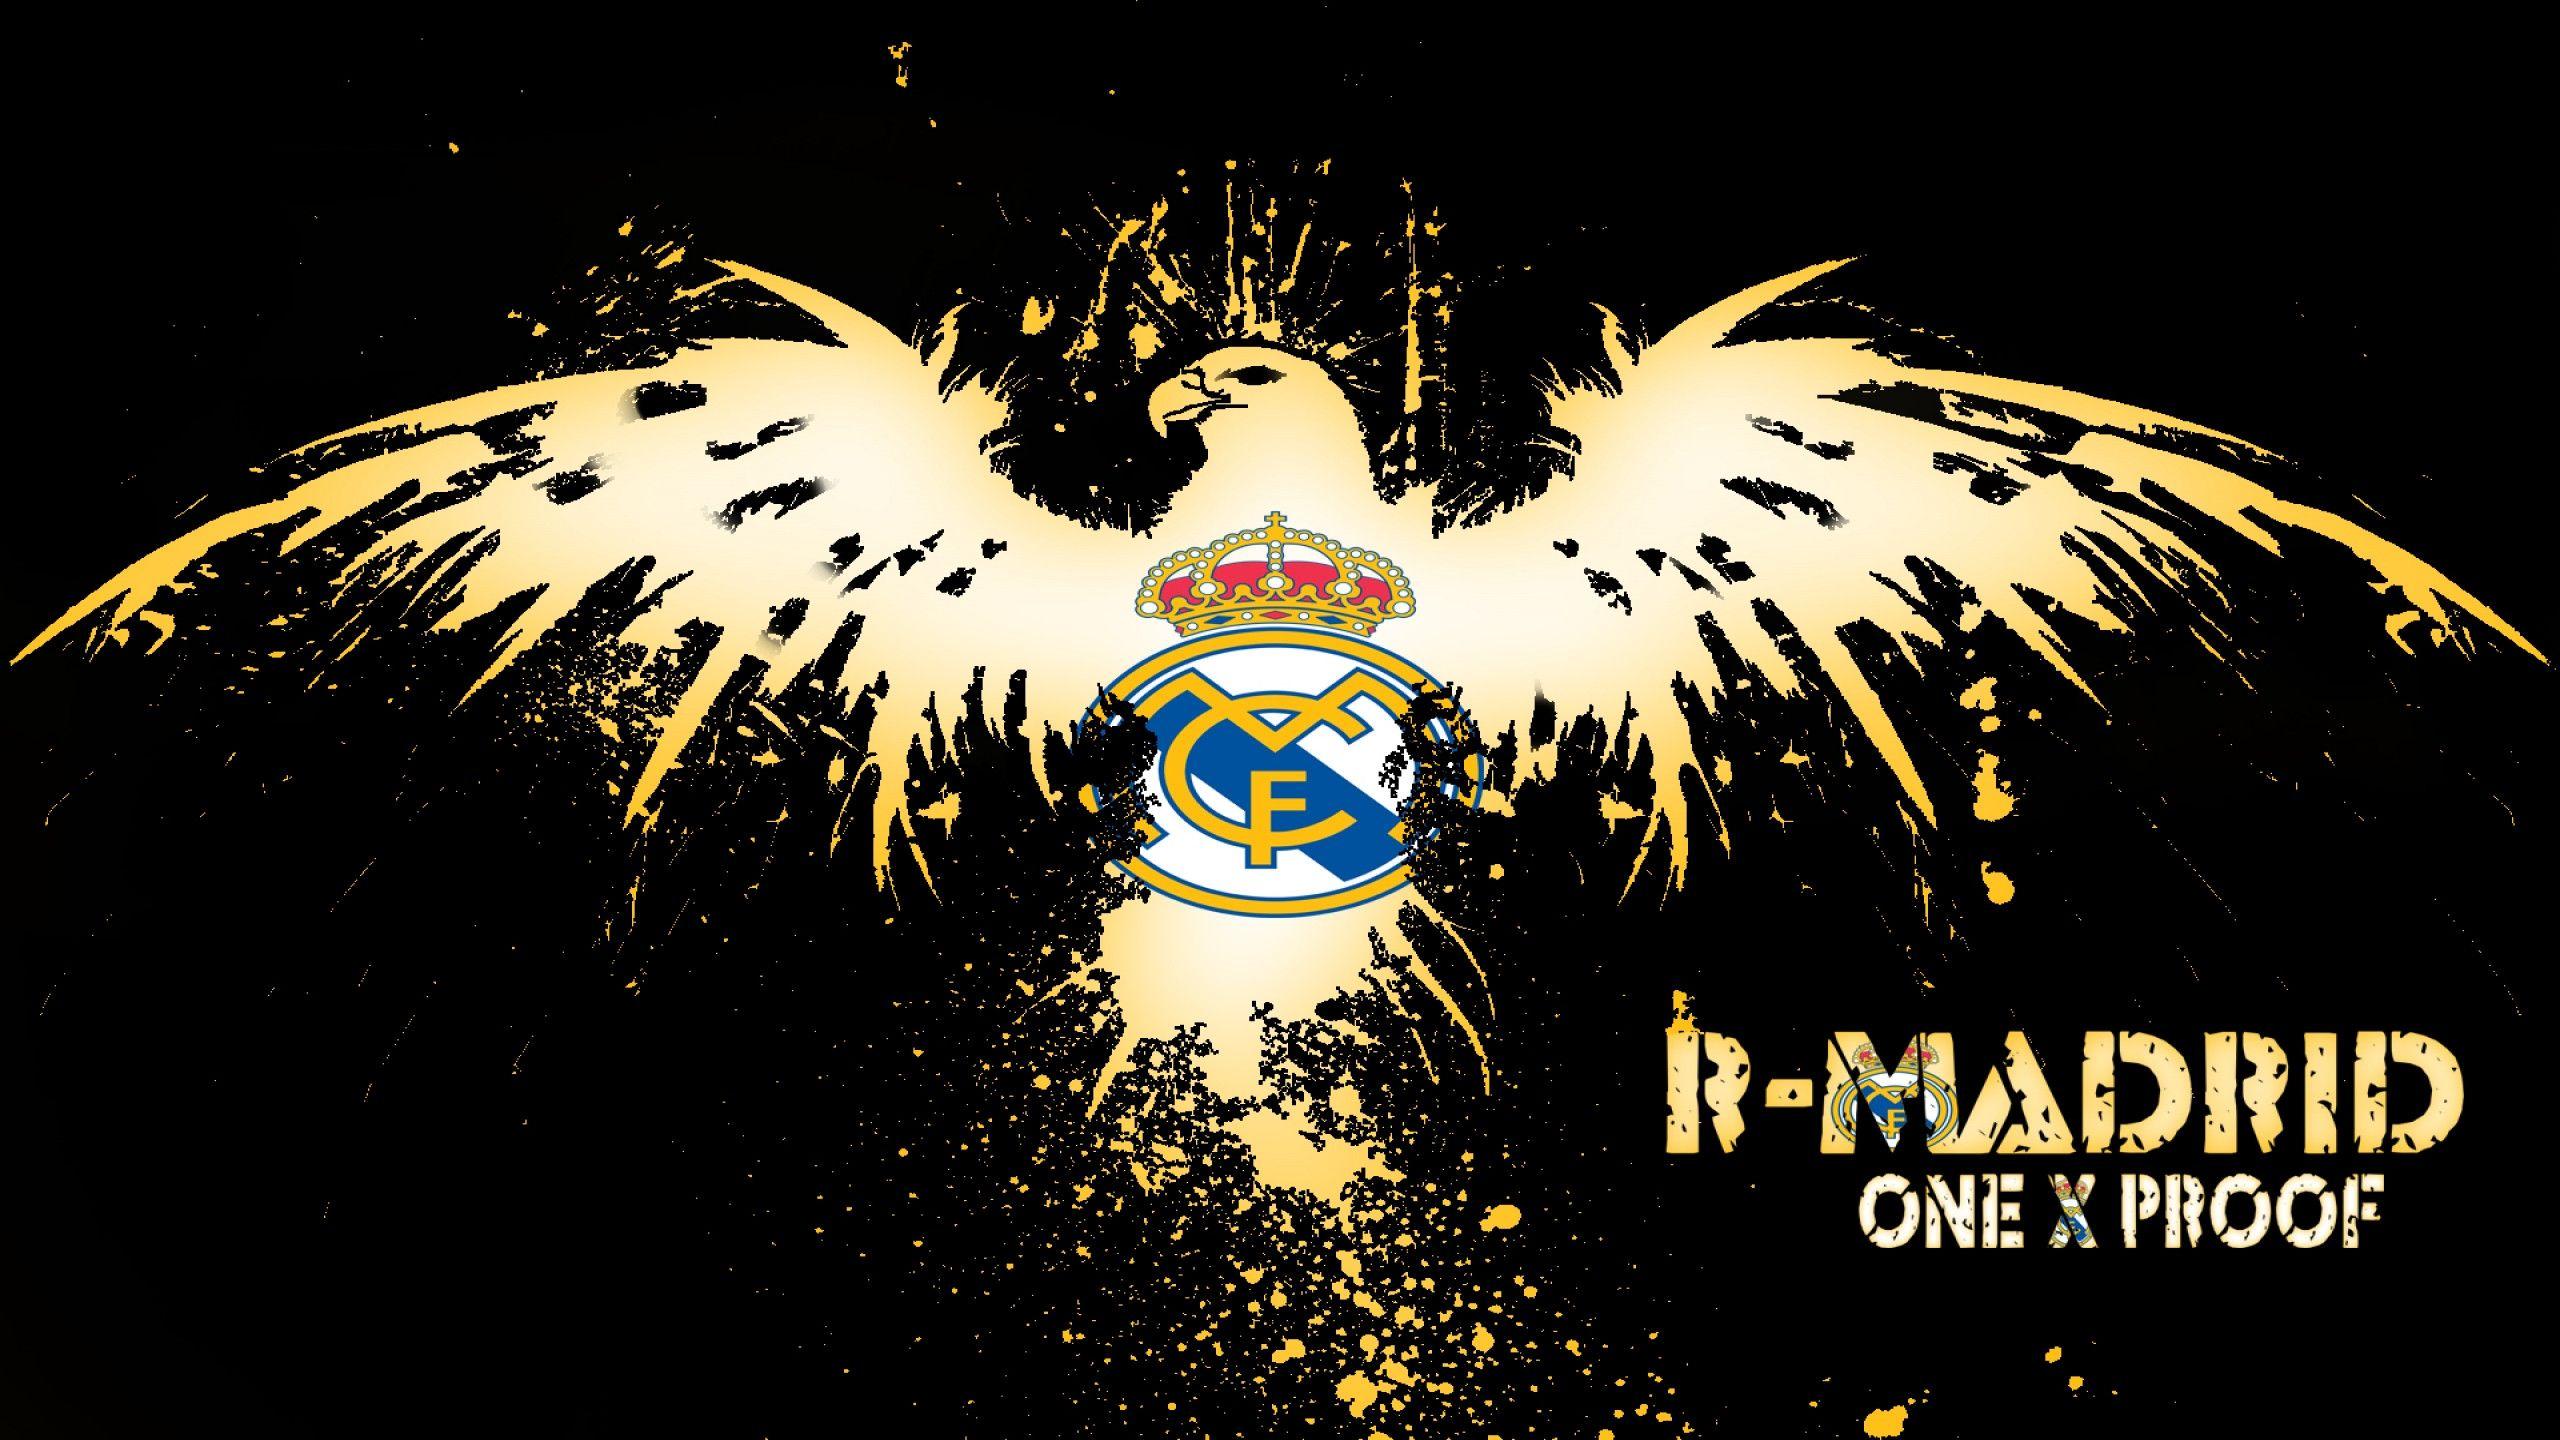 Real Madrid Cf Logo HD Wallpaper 5389 Wallpaper computer best 2560x1440